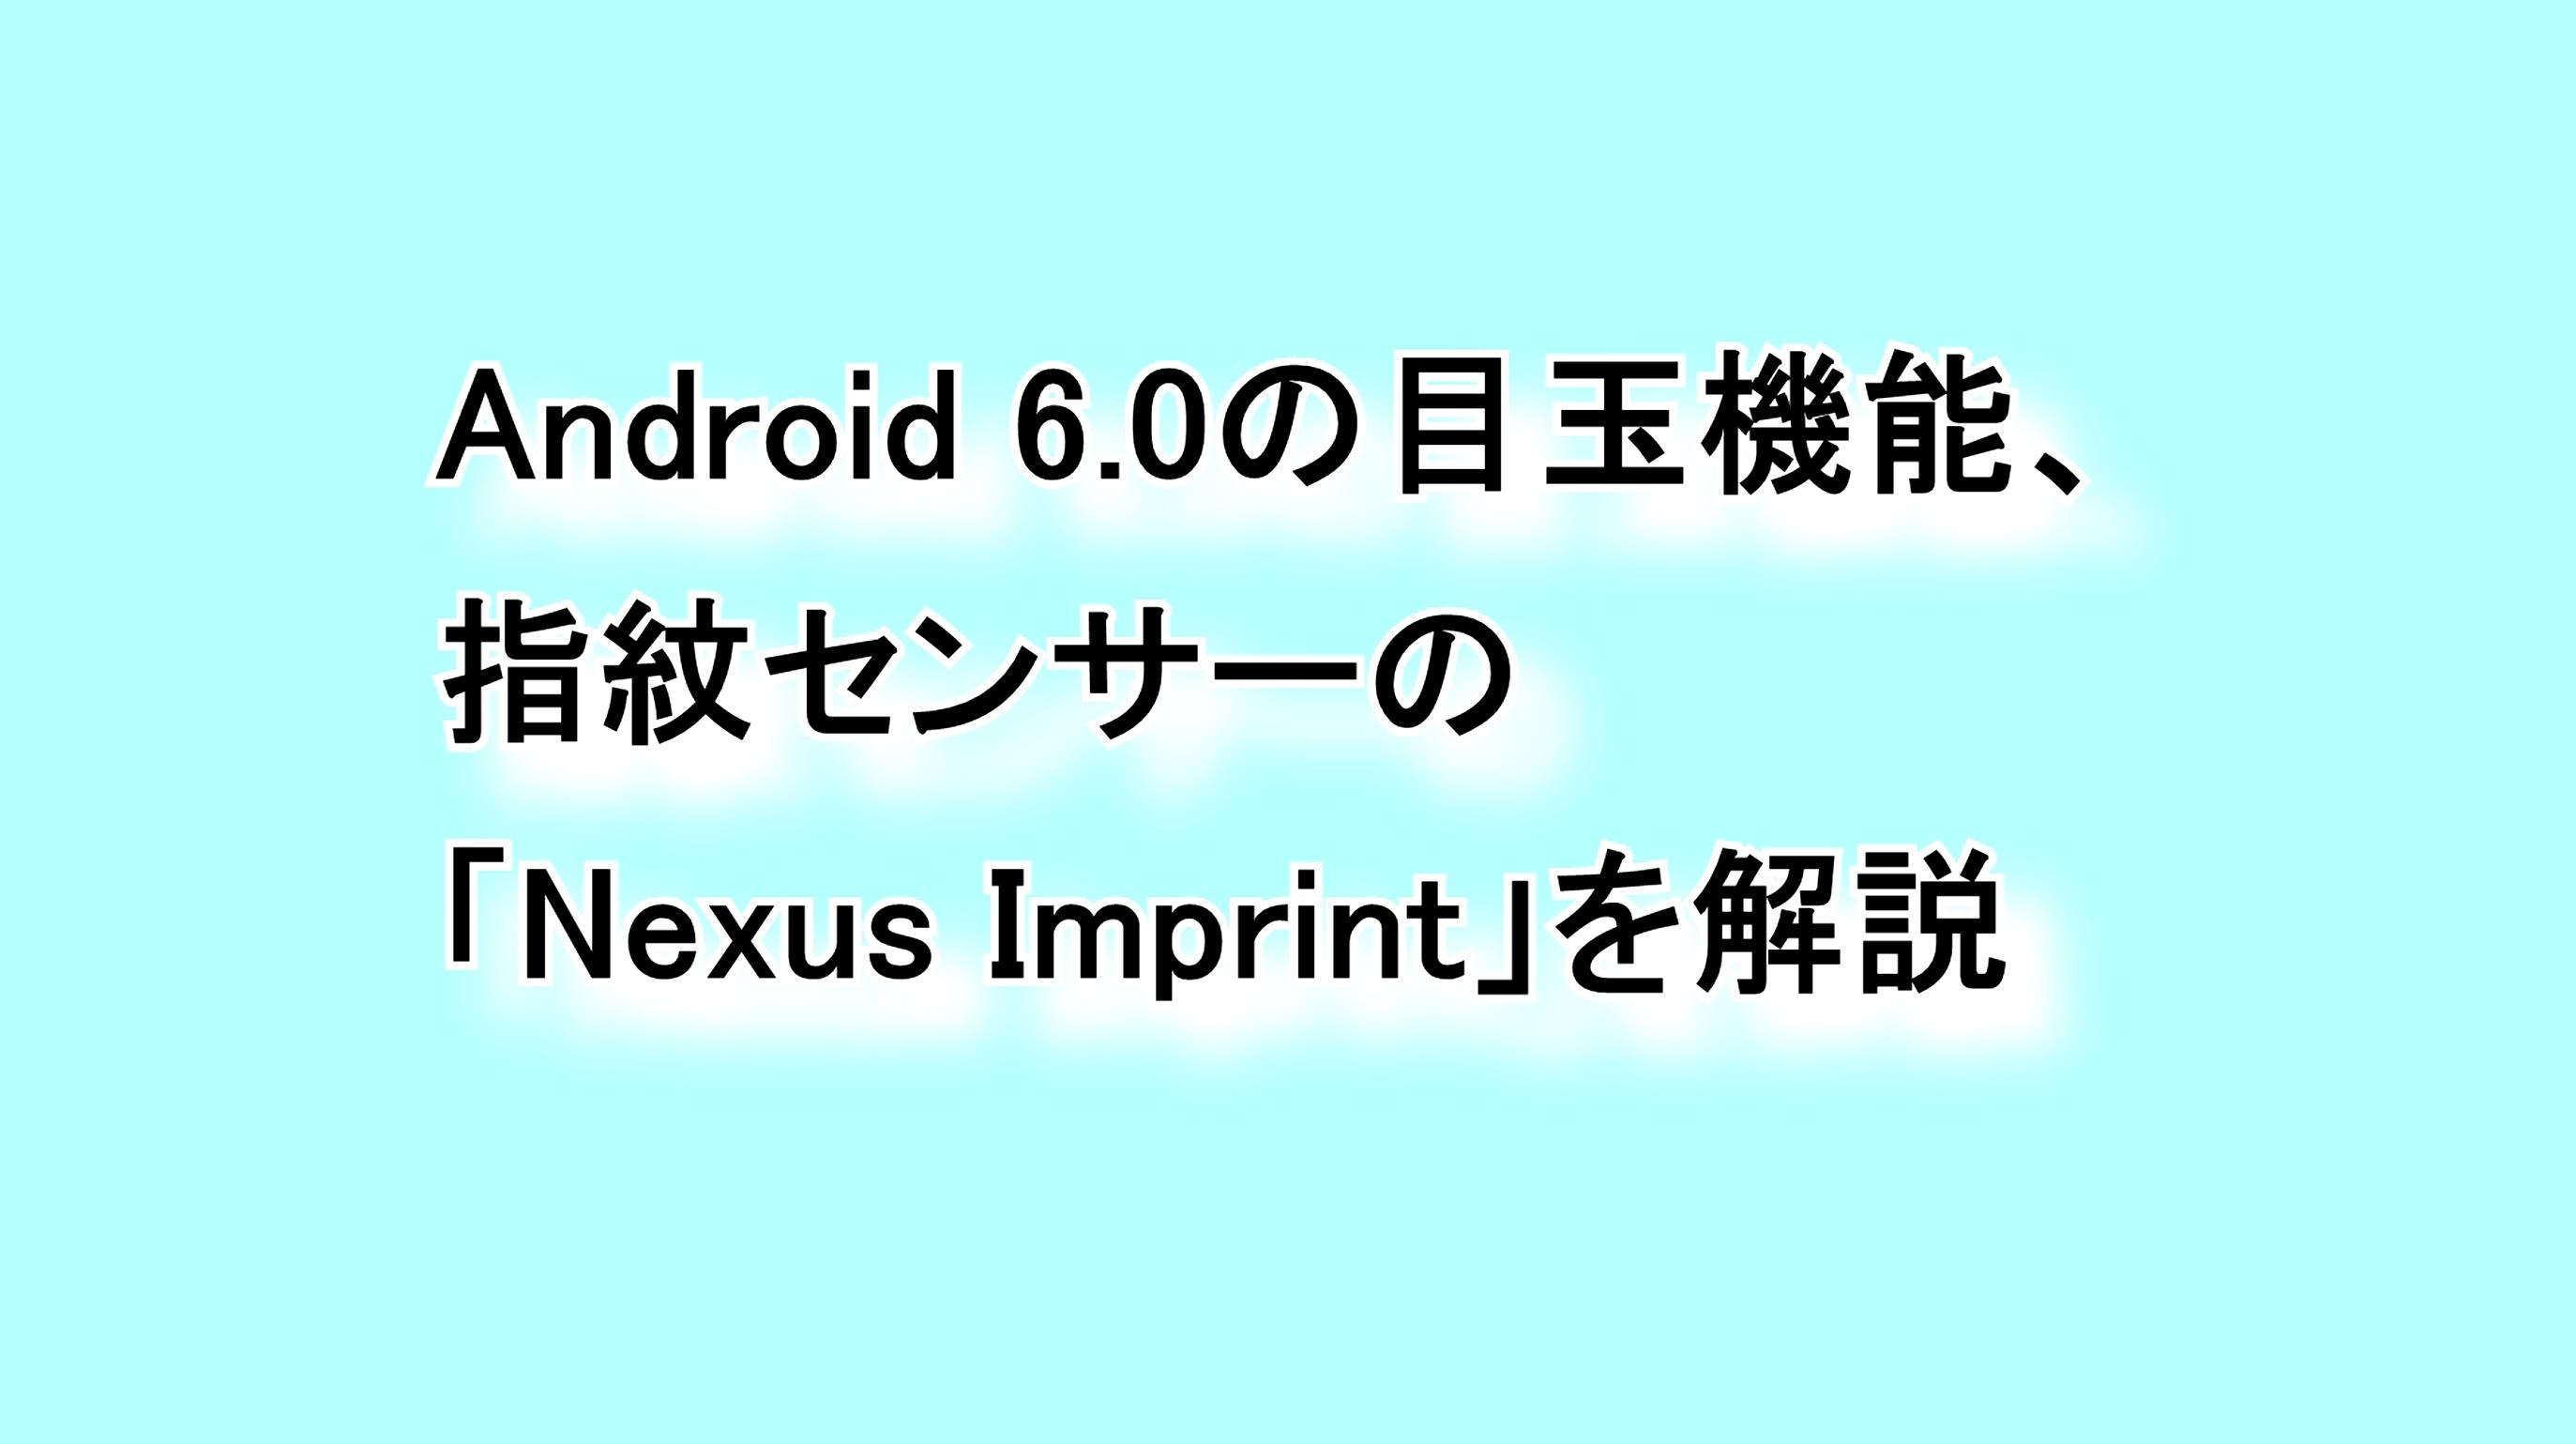 Android 6.0の目玉機能 指紋センサーの「Nexus Imprint」を解説